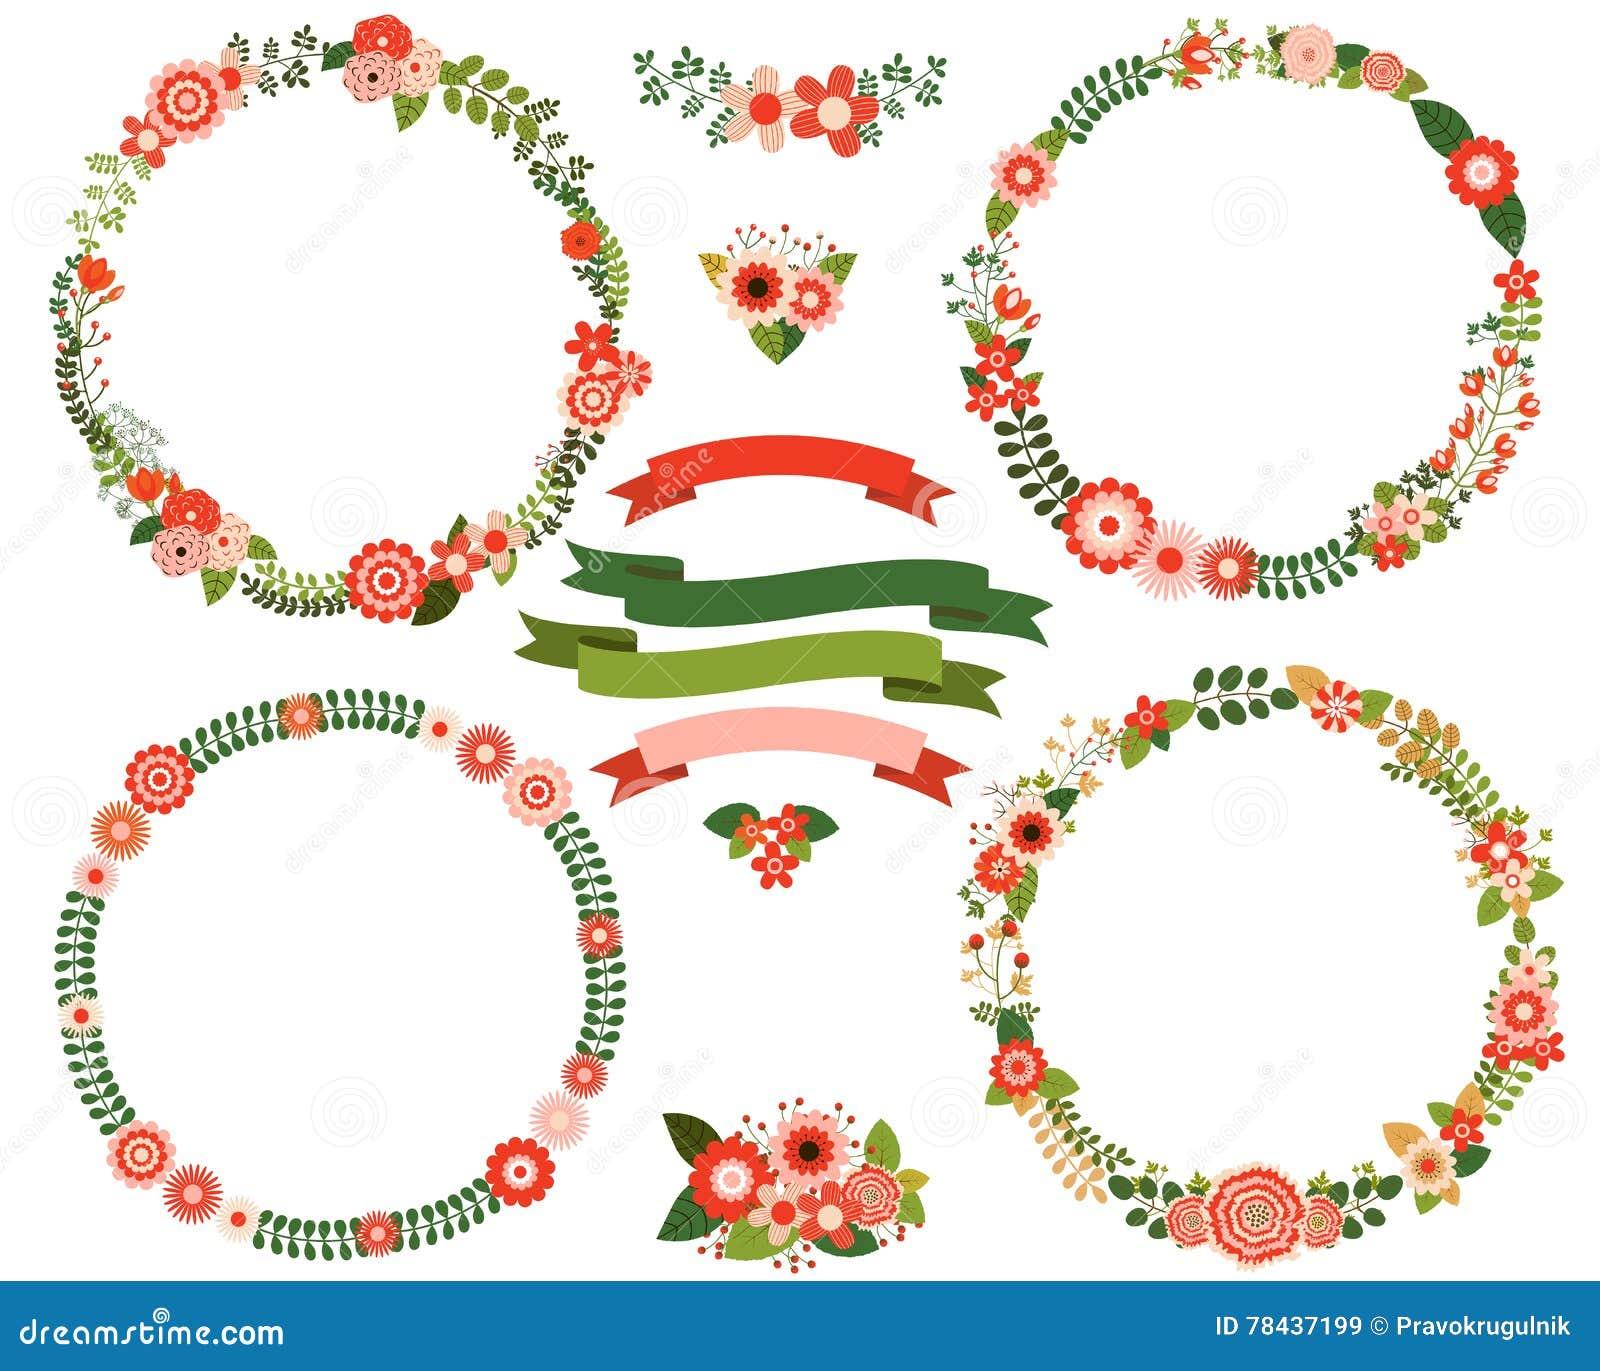 Christmas Flower Wreath Borders Stock Vector - Illustration of ...